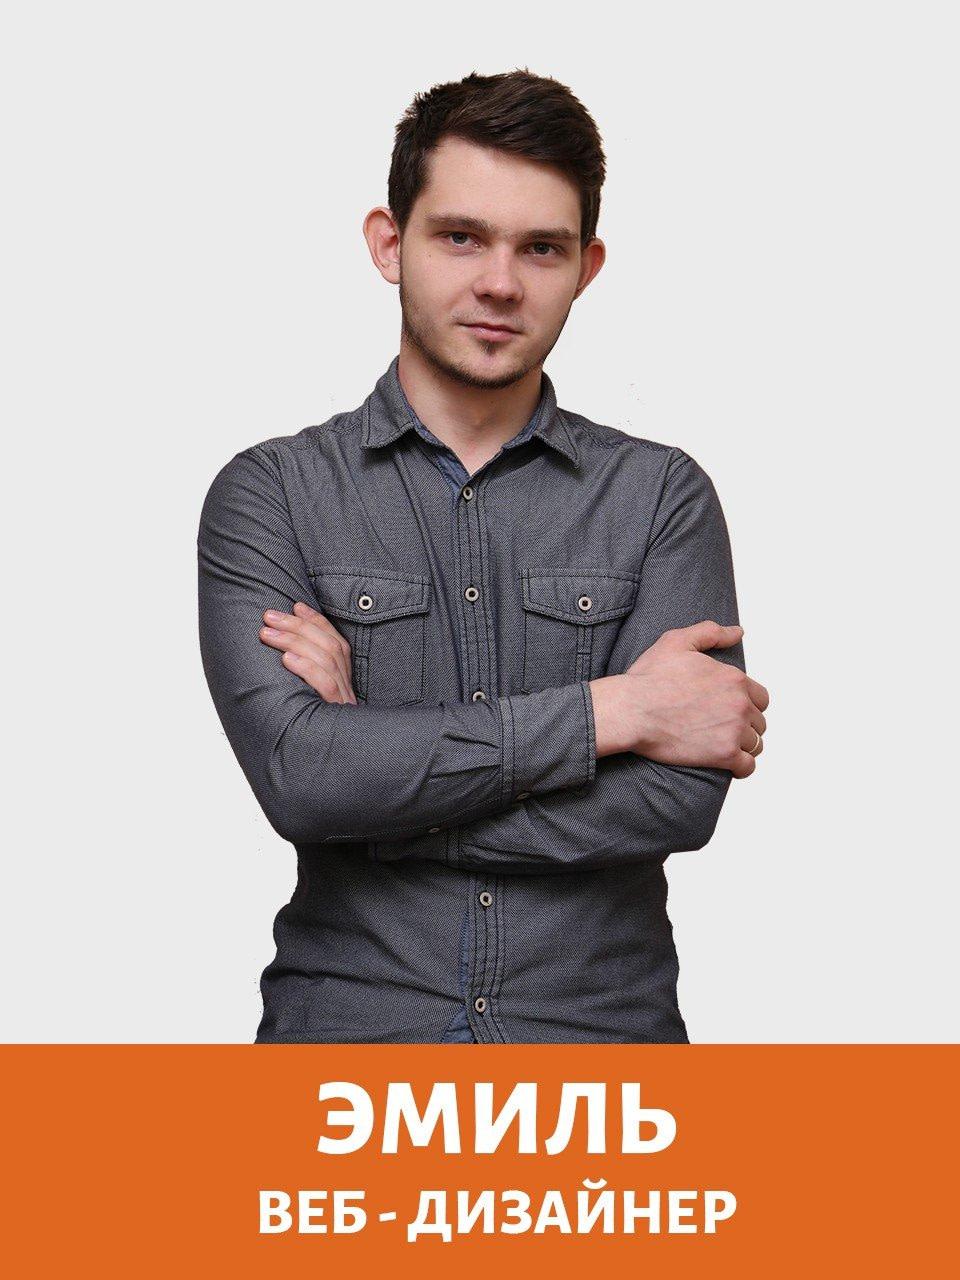 jemil veb dizajner - Главная